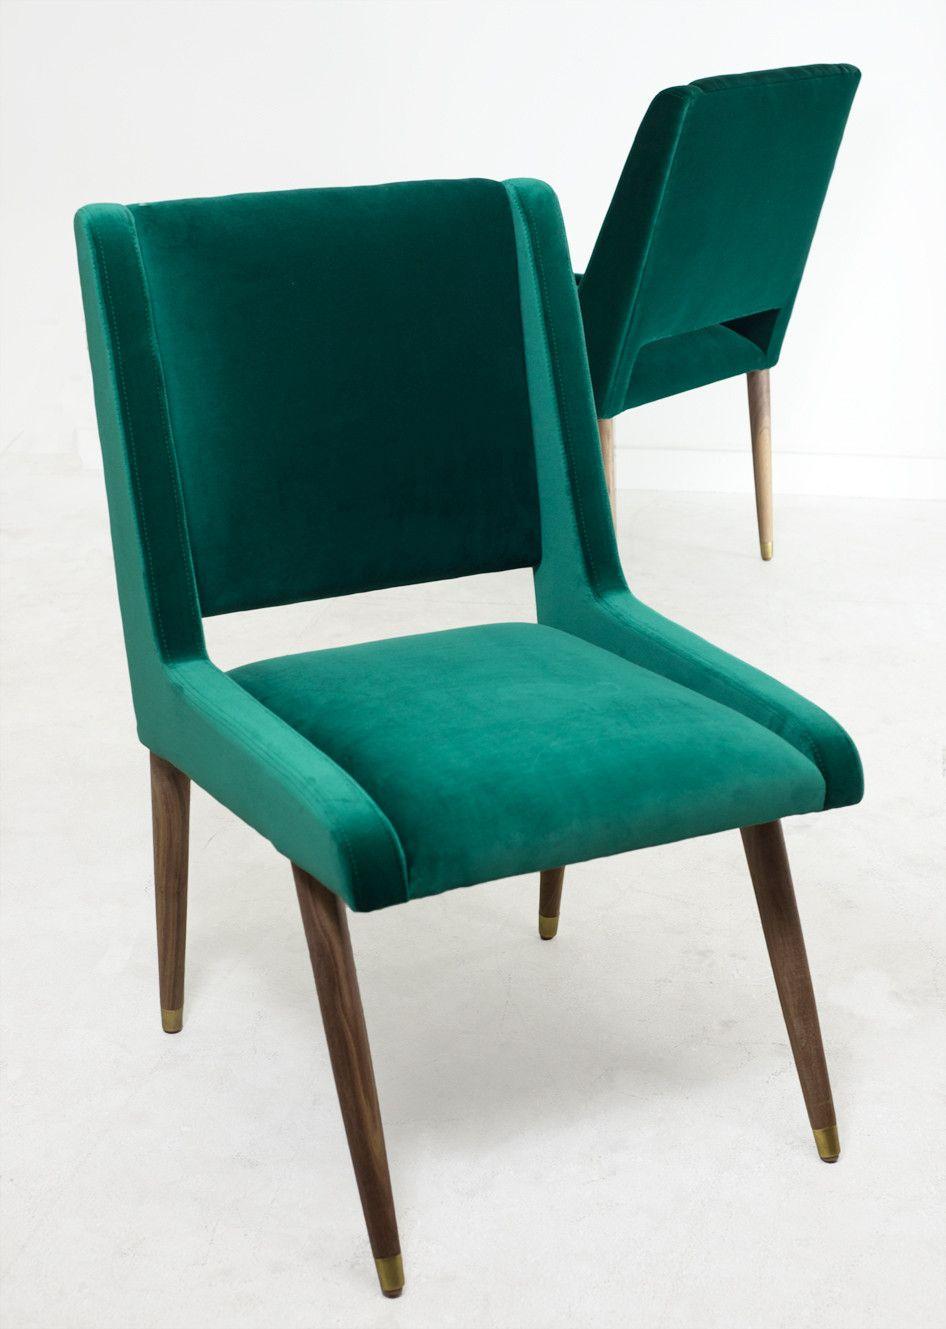 mid century dining chair in regal laguna | mid-century modern